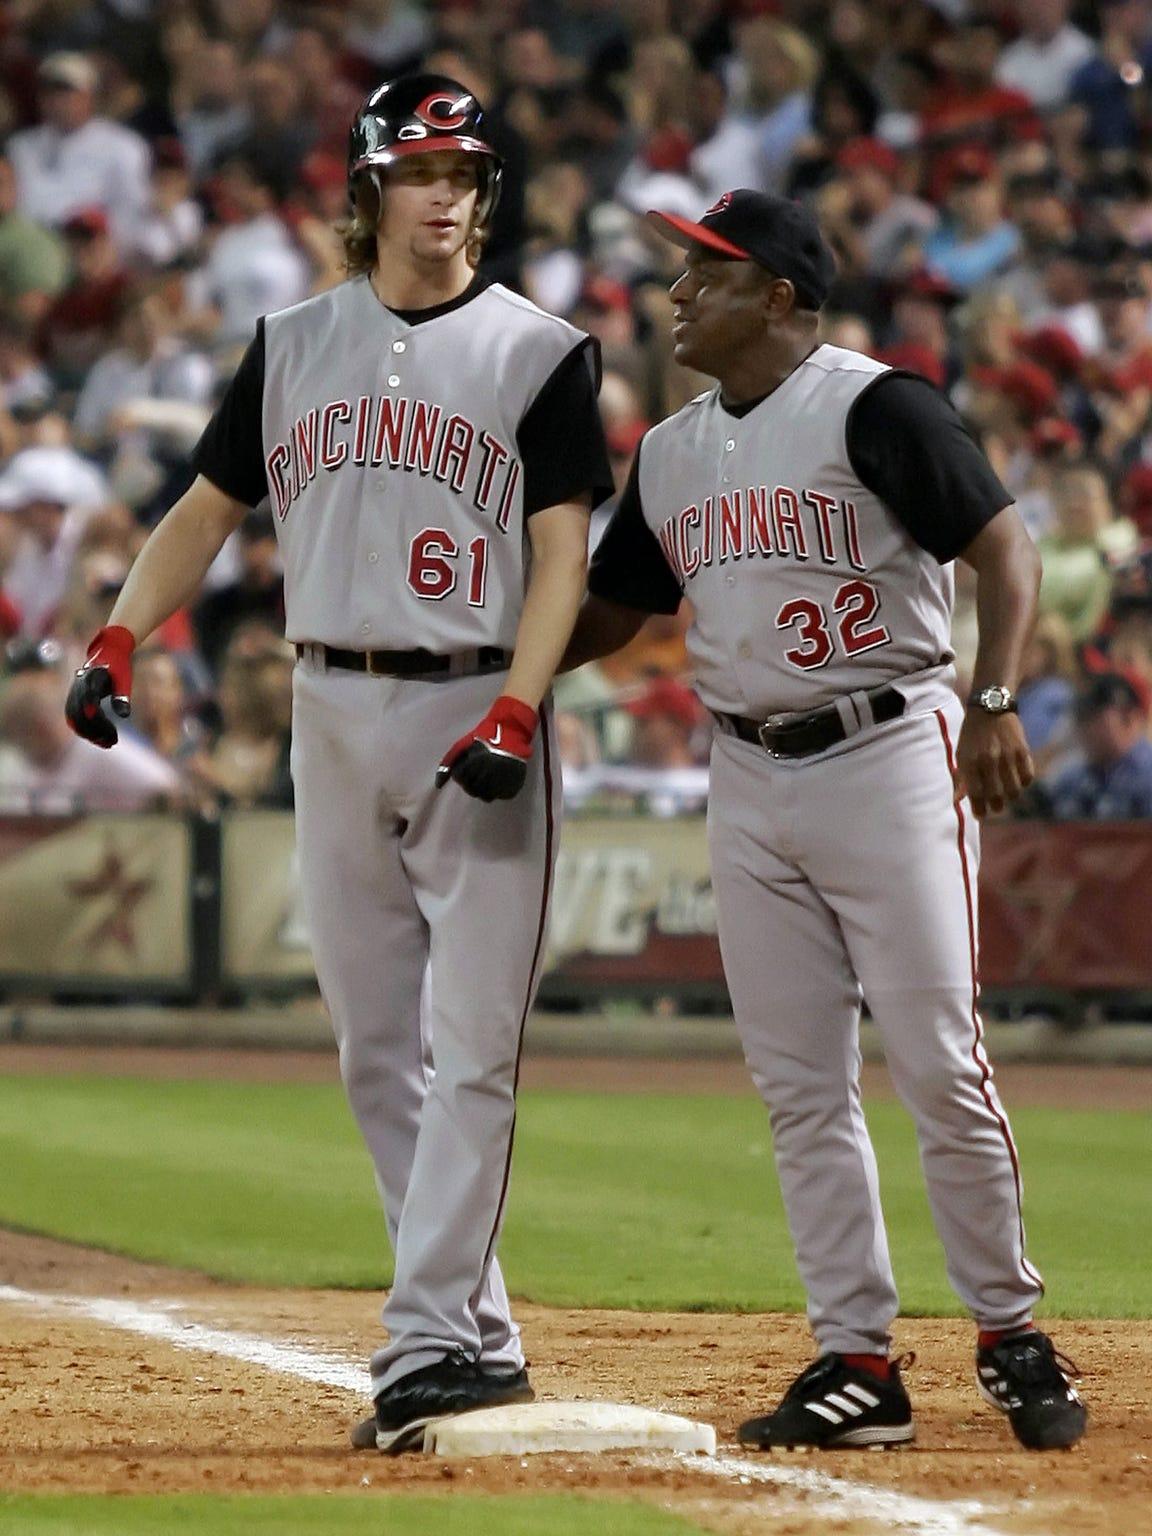 6-4-06, 6D  Cincinnati Reds pitcher Bronson Arroyo